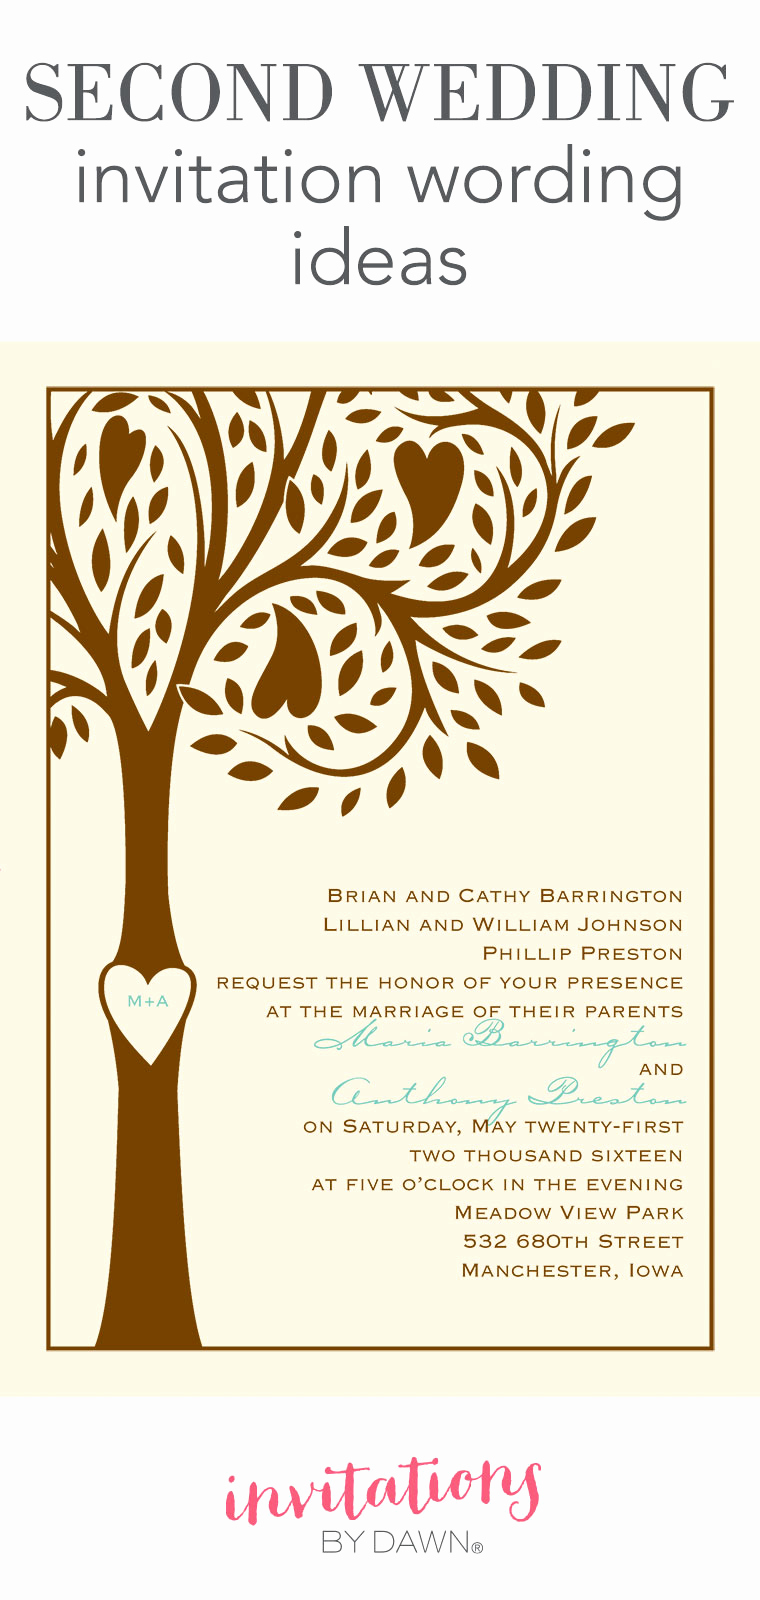 Second Wedding Invitation Wording Lovely Second Wedding Invitation Wording